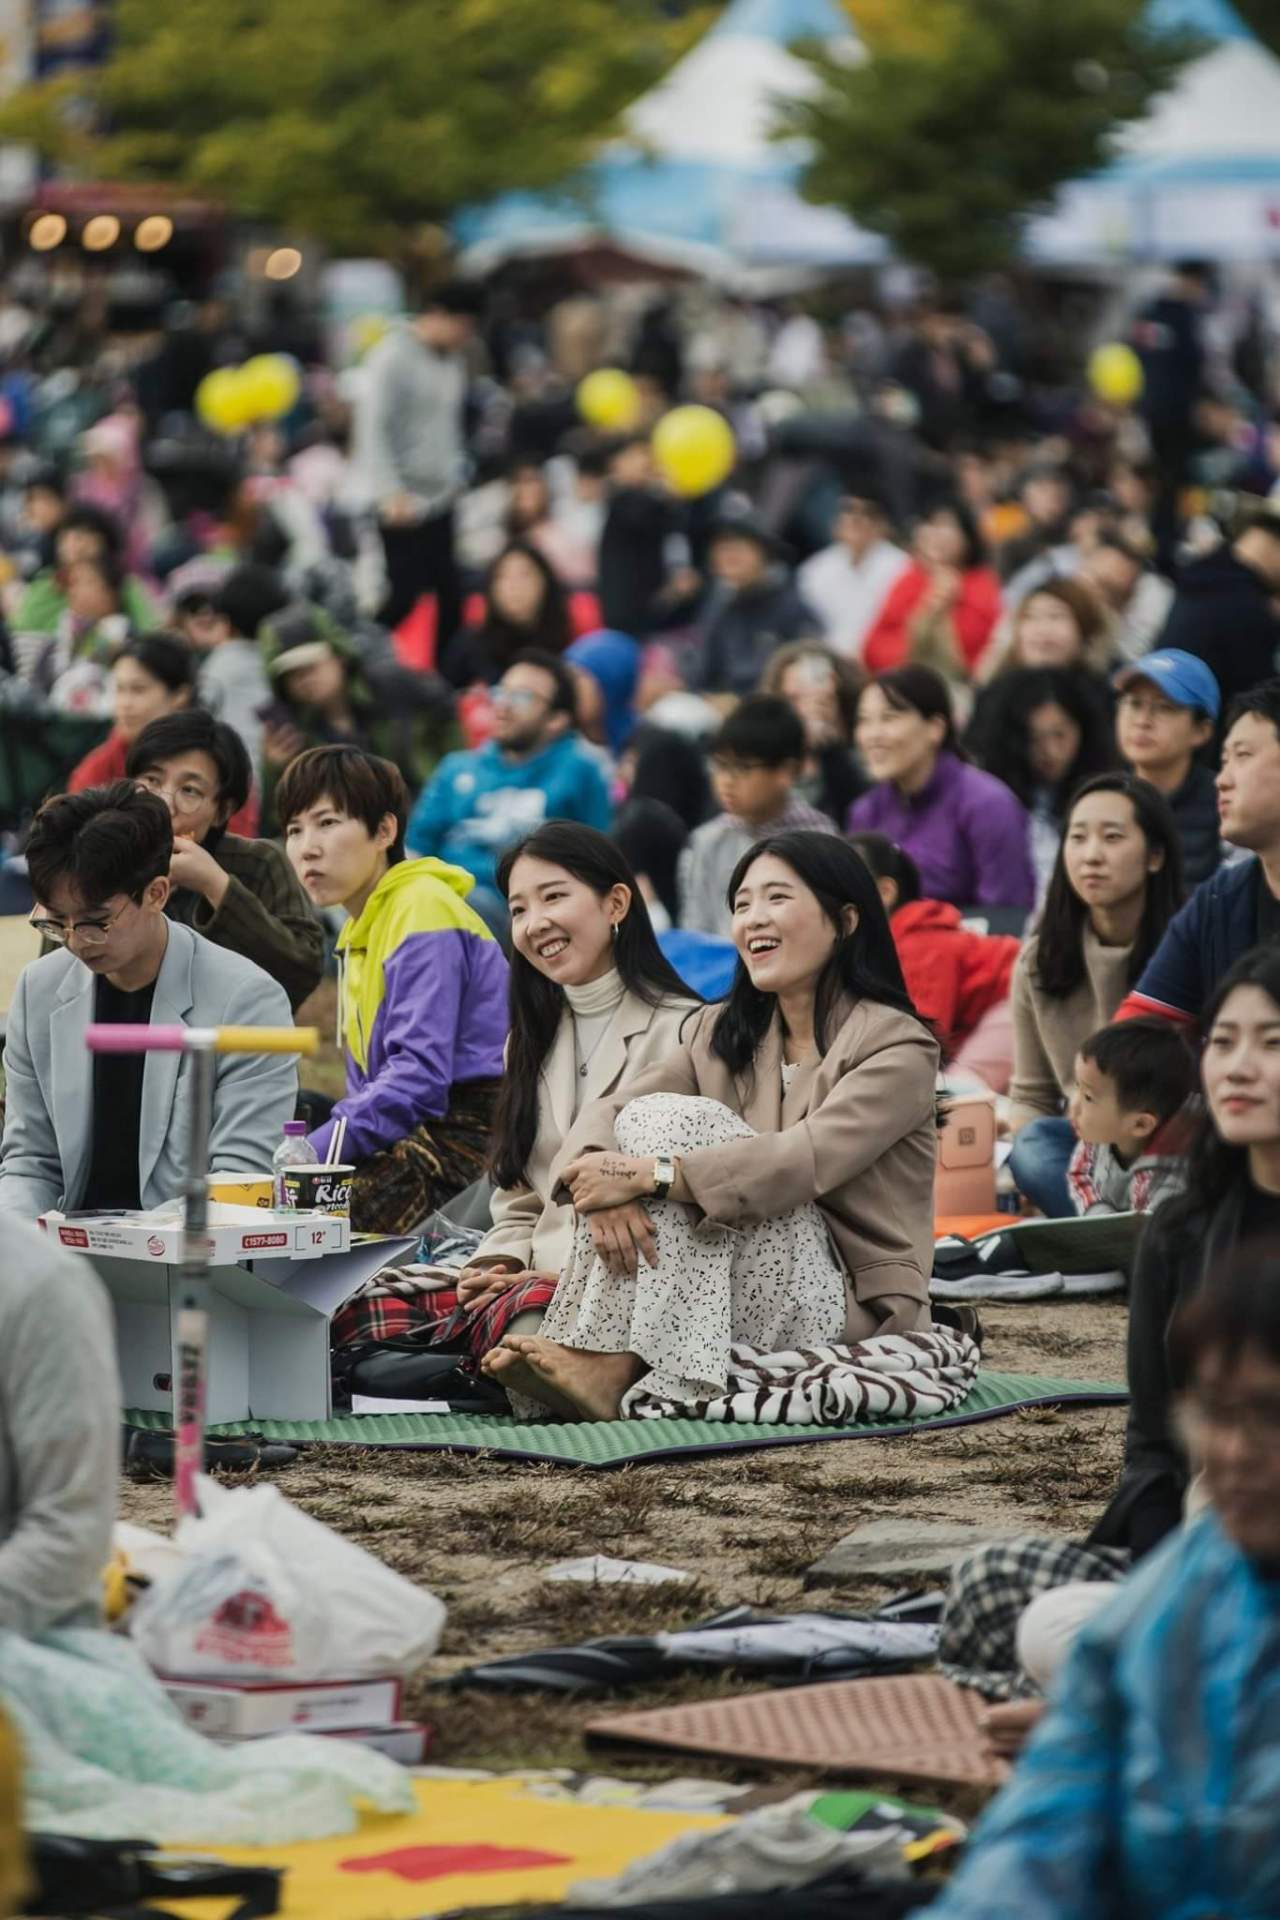 Attendees of the Jarasum International Jazz Festival enjoy music on the island of Jarasum in Gapyeong, Gyeonggi Province. (JJF)